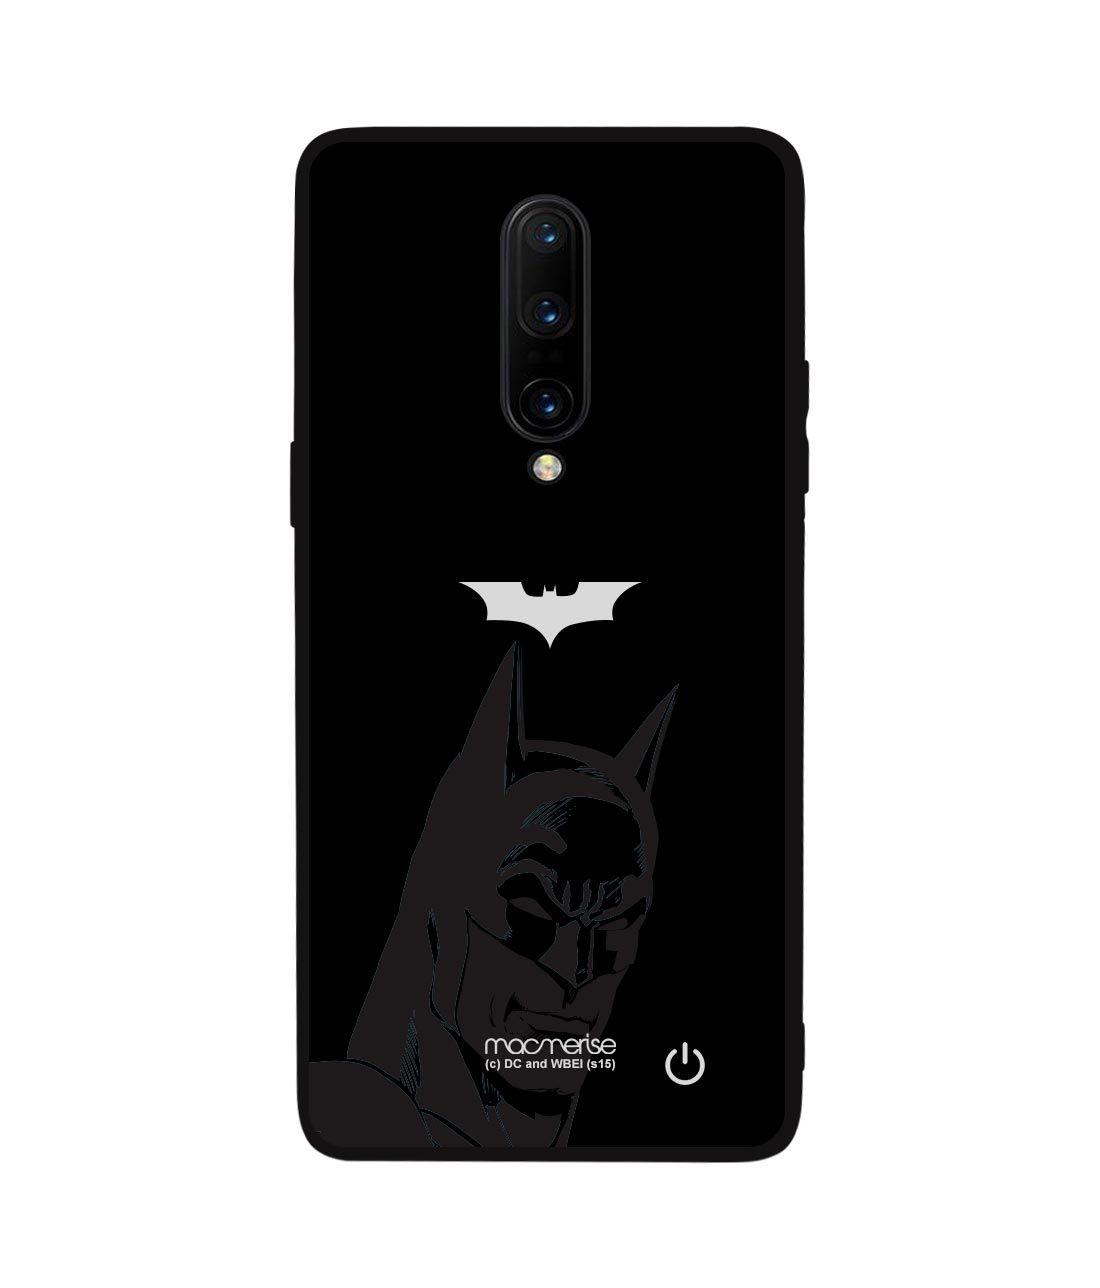 Silhouette Batman - Lumous LED Phone Case for OnePlus 8